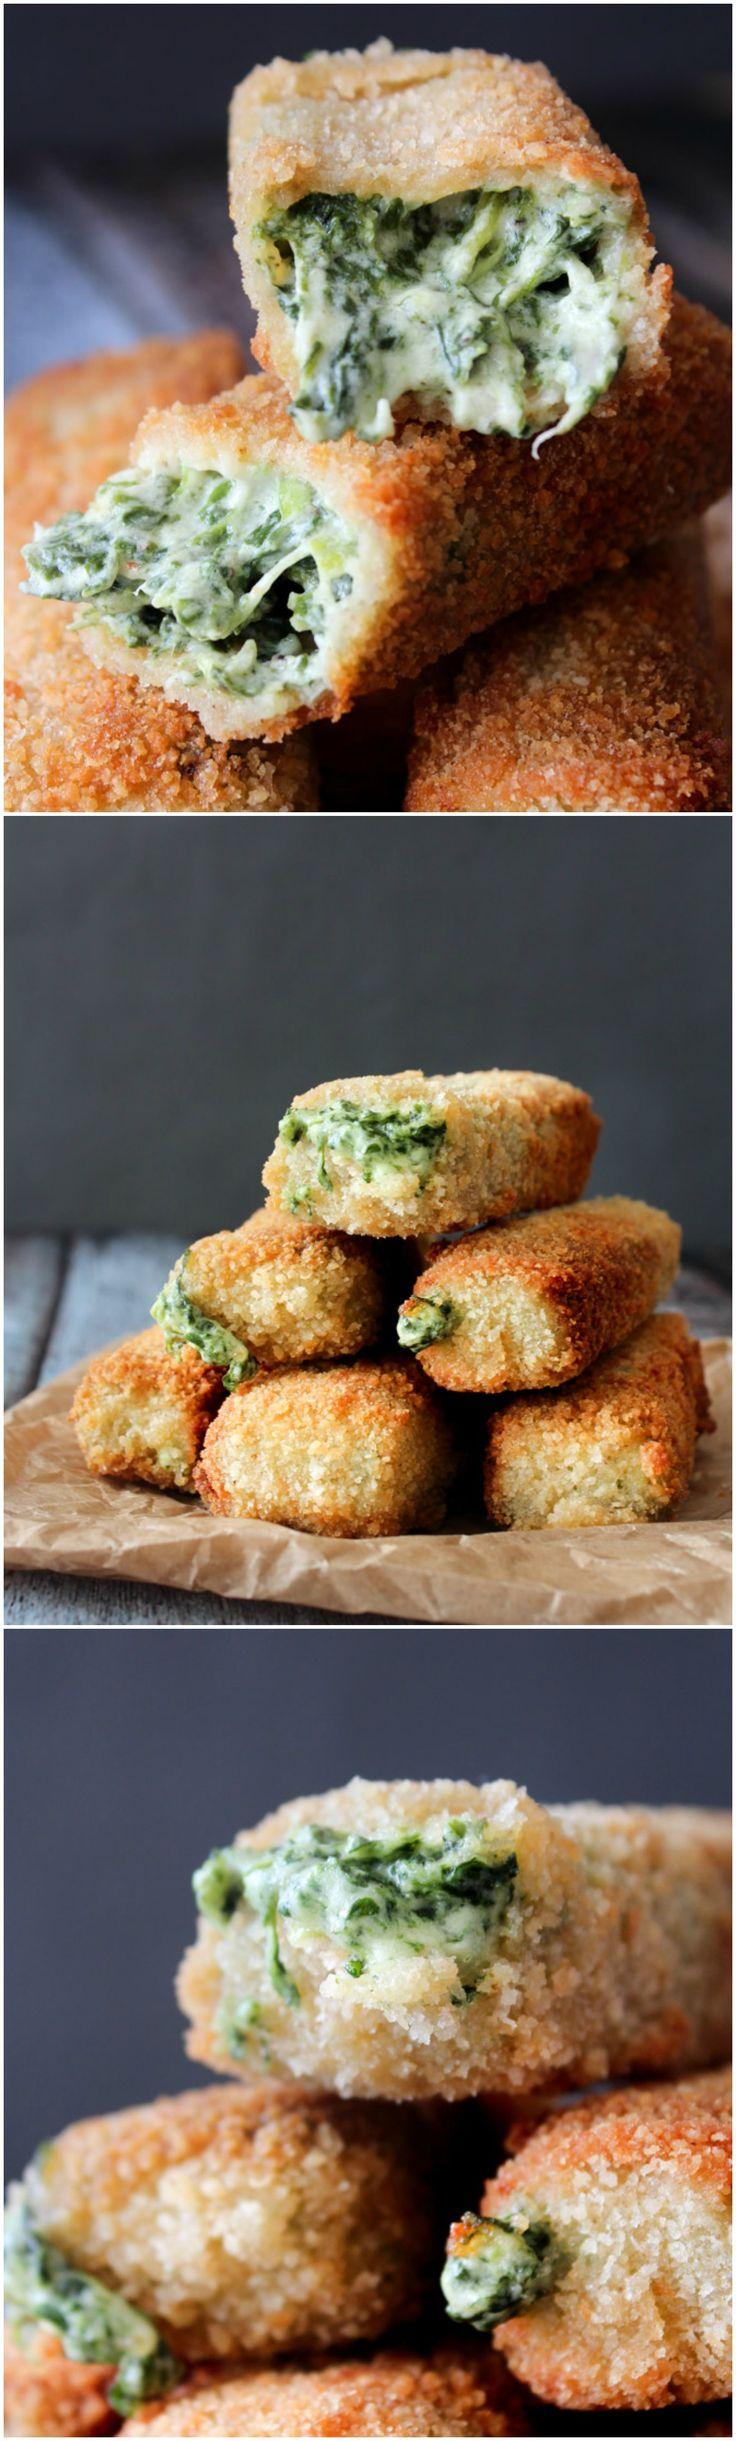 Spinach Dip Sticks - Mozzarella Sticks - Cheese Sticks - Spinach Dip - Cheese Dip - Cheese Snack - Party Food